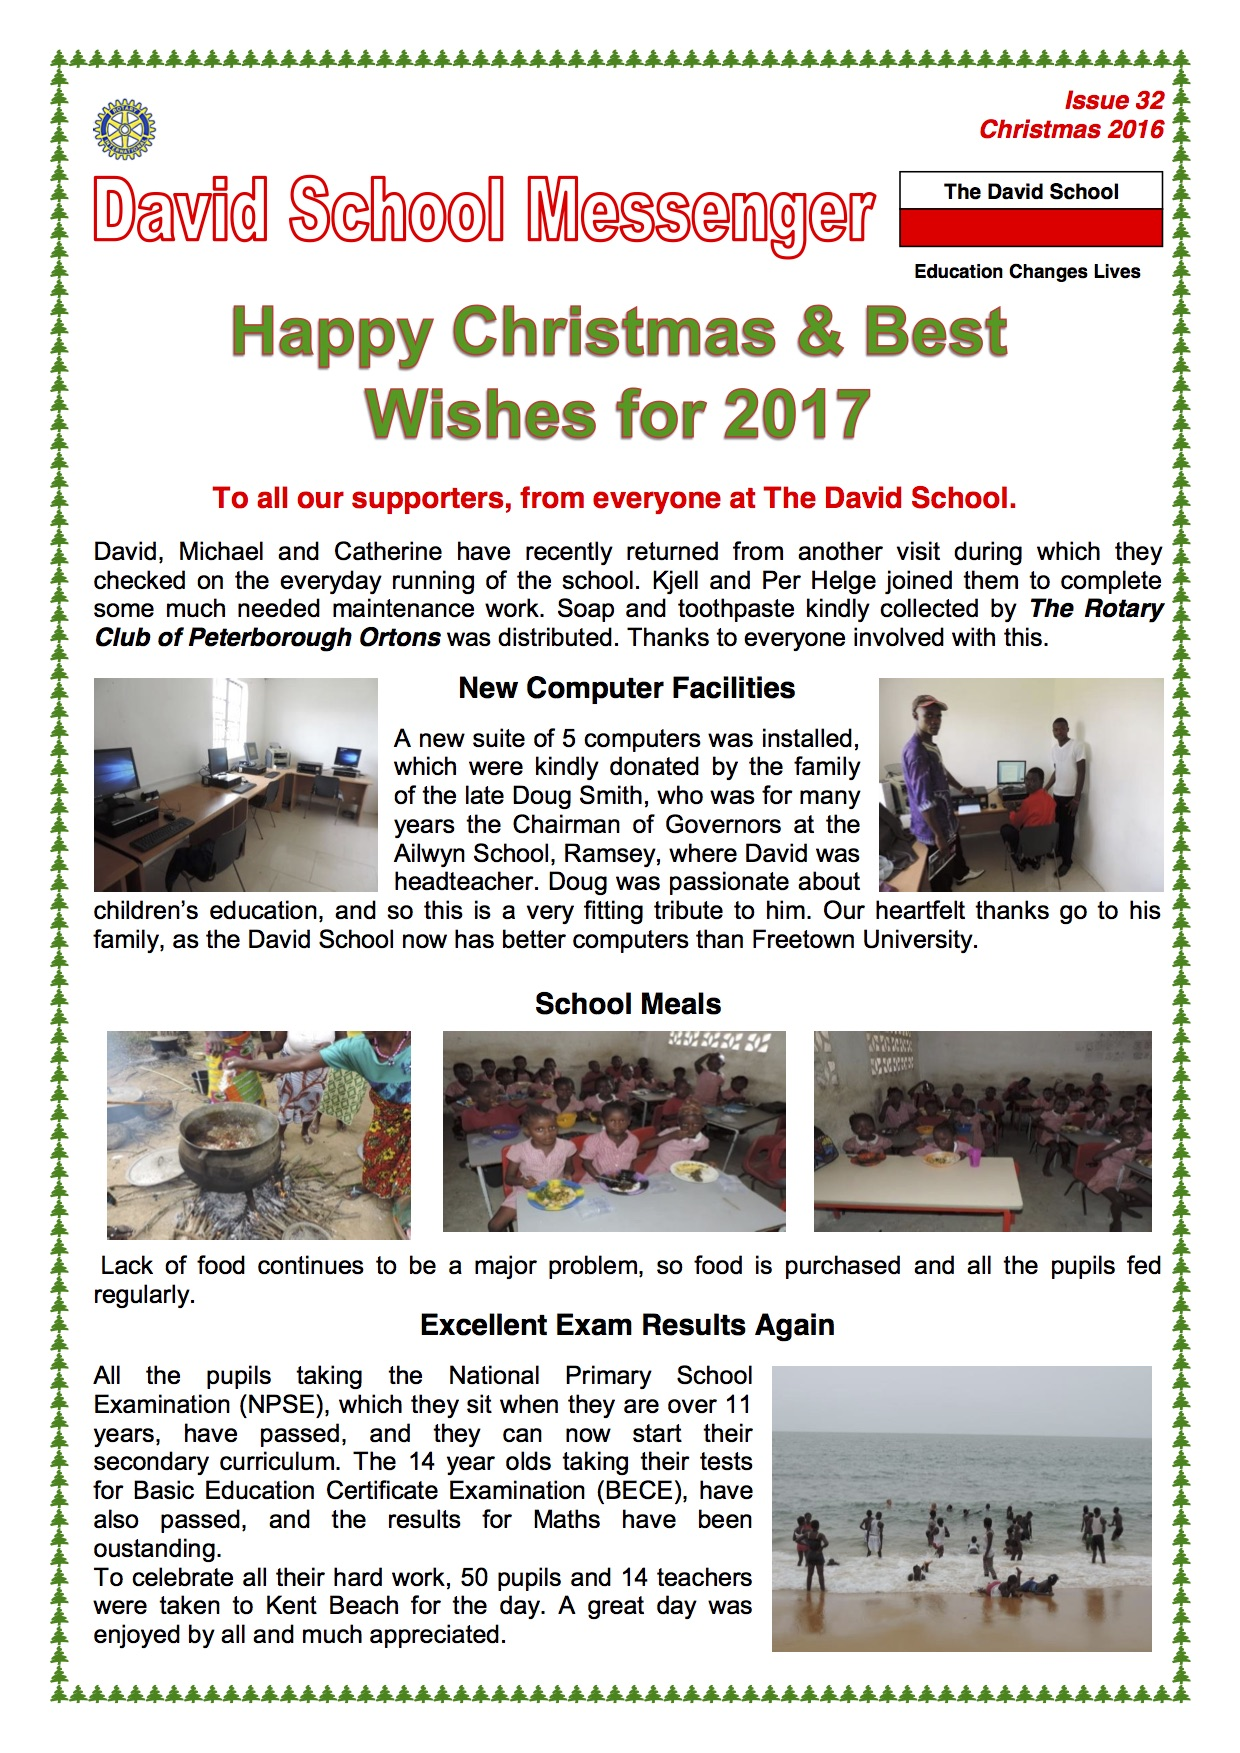 The David School Messenger 32 Christmas 2016p01.jpg